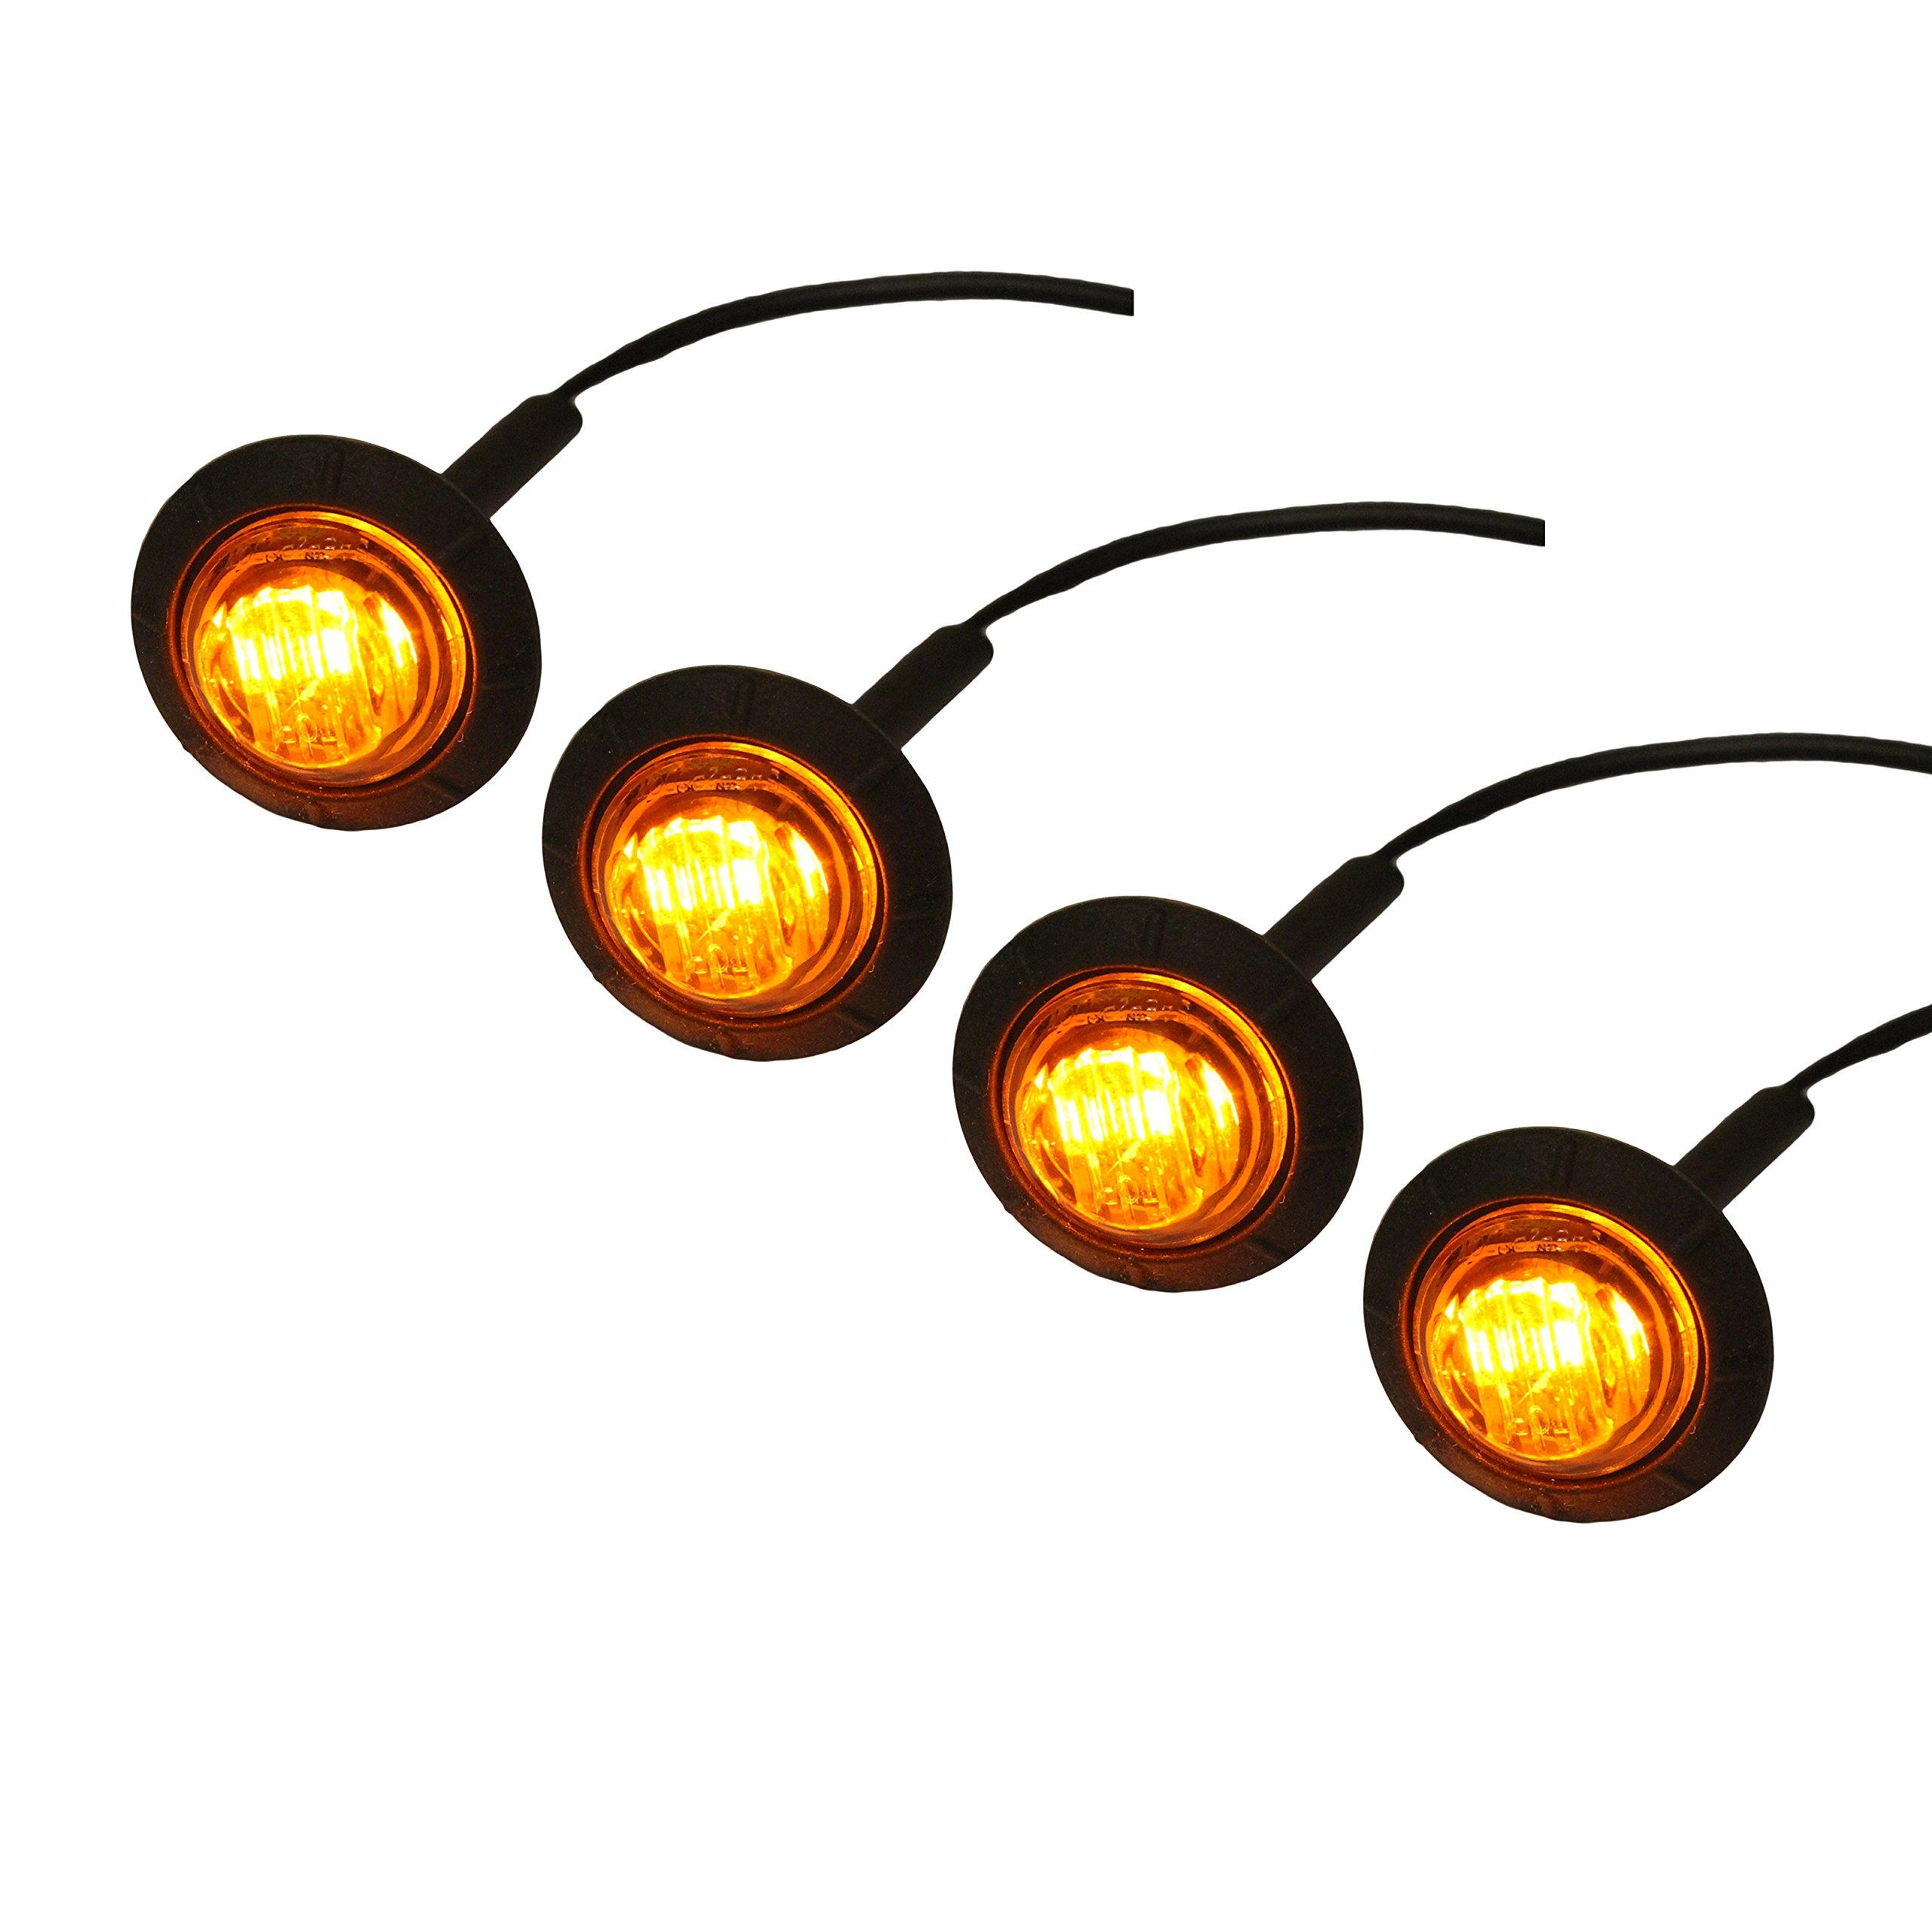 4 PACK: 3/4'' Recessed LED Lights for Marker / Signal (Amber)